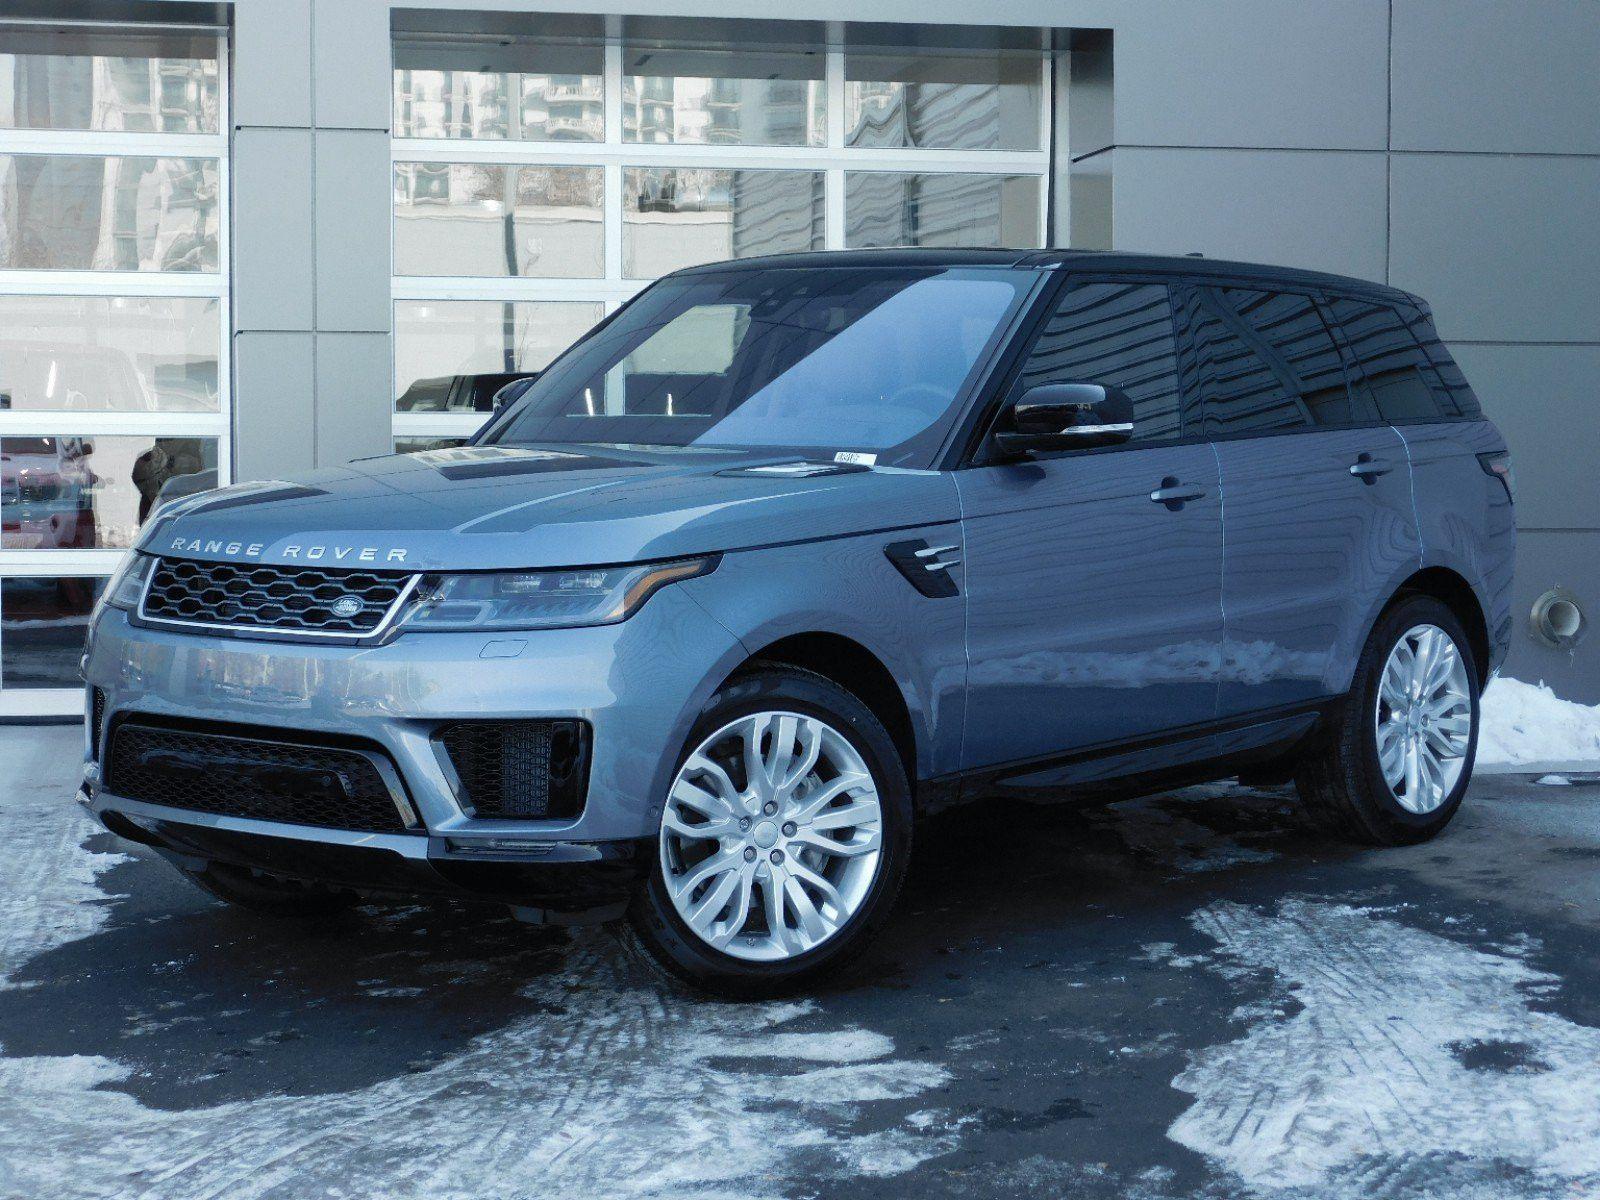 2019 Range Rover Sport Svr For Sale 197 New 2019 Land Rover Range Rover Sport Hse 4 Door In Salt Lake City Range Rover Sport Range Rover Land Rover